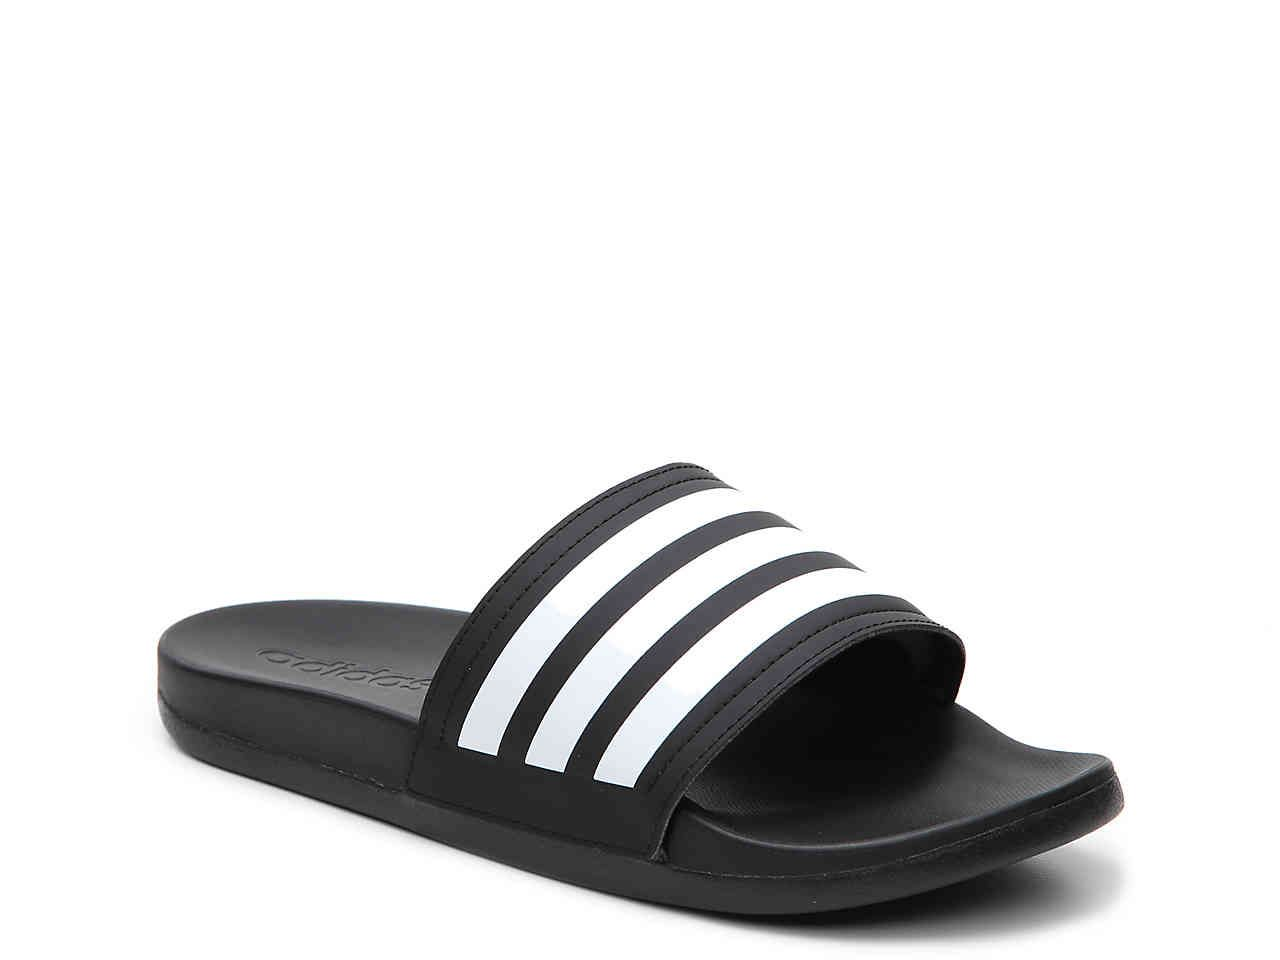 adidas Adilette Cloudfoam Ultra Stripes Slide Sandal